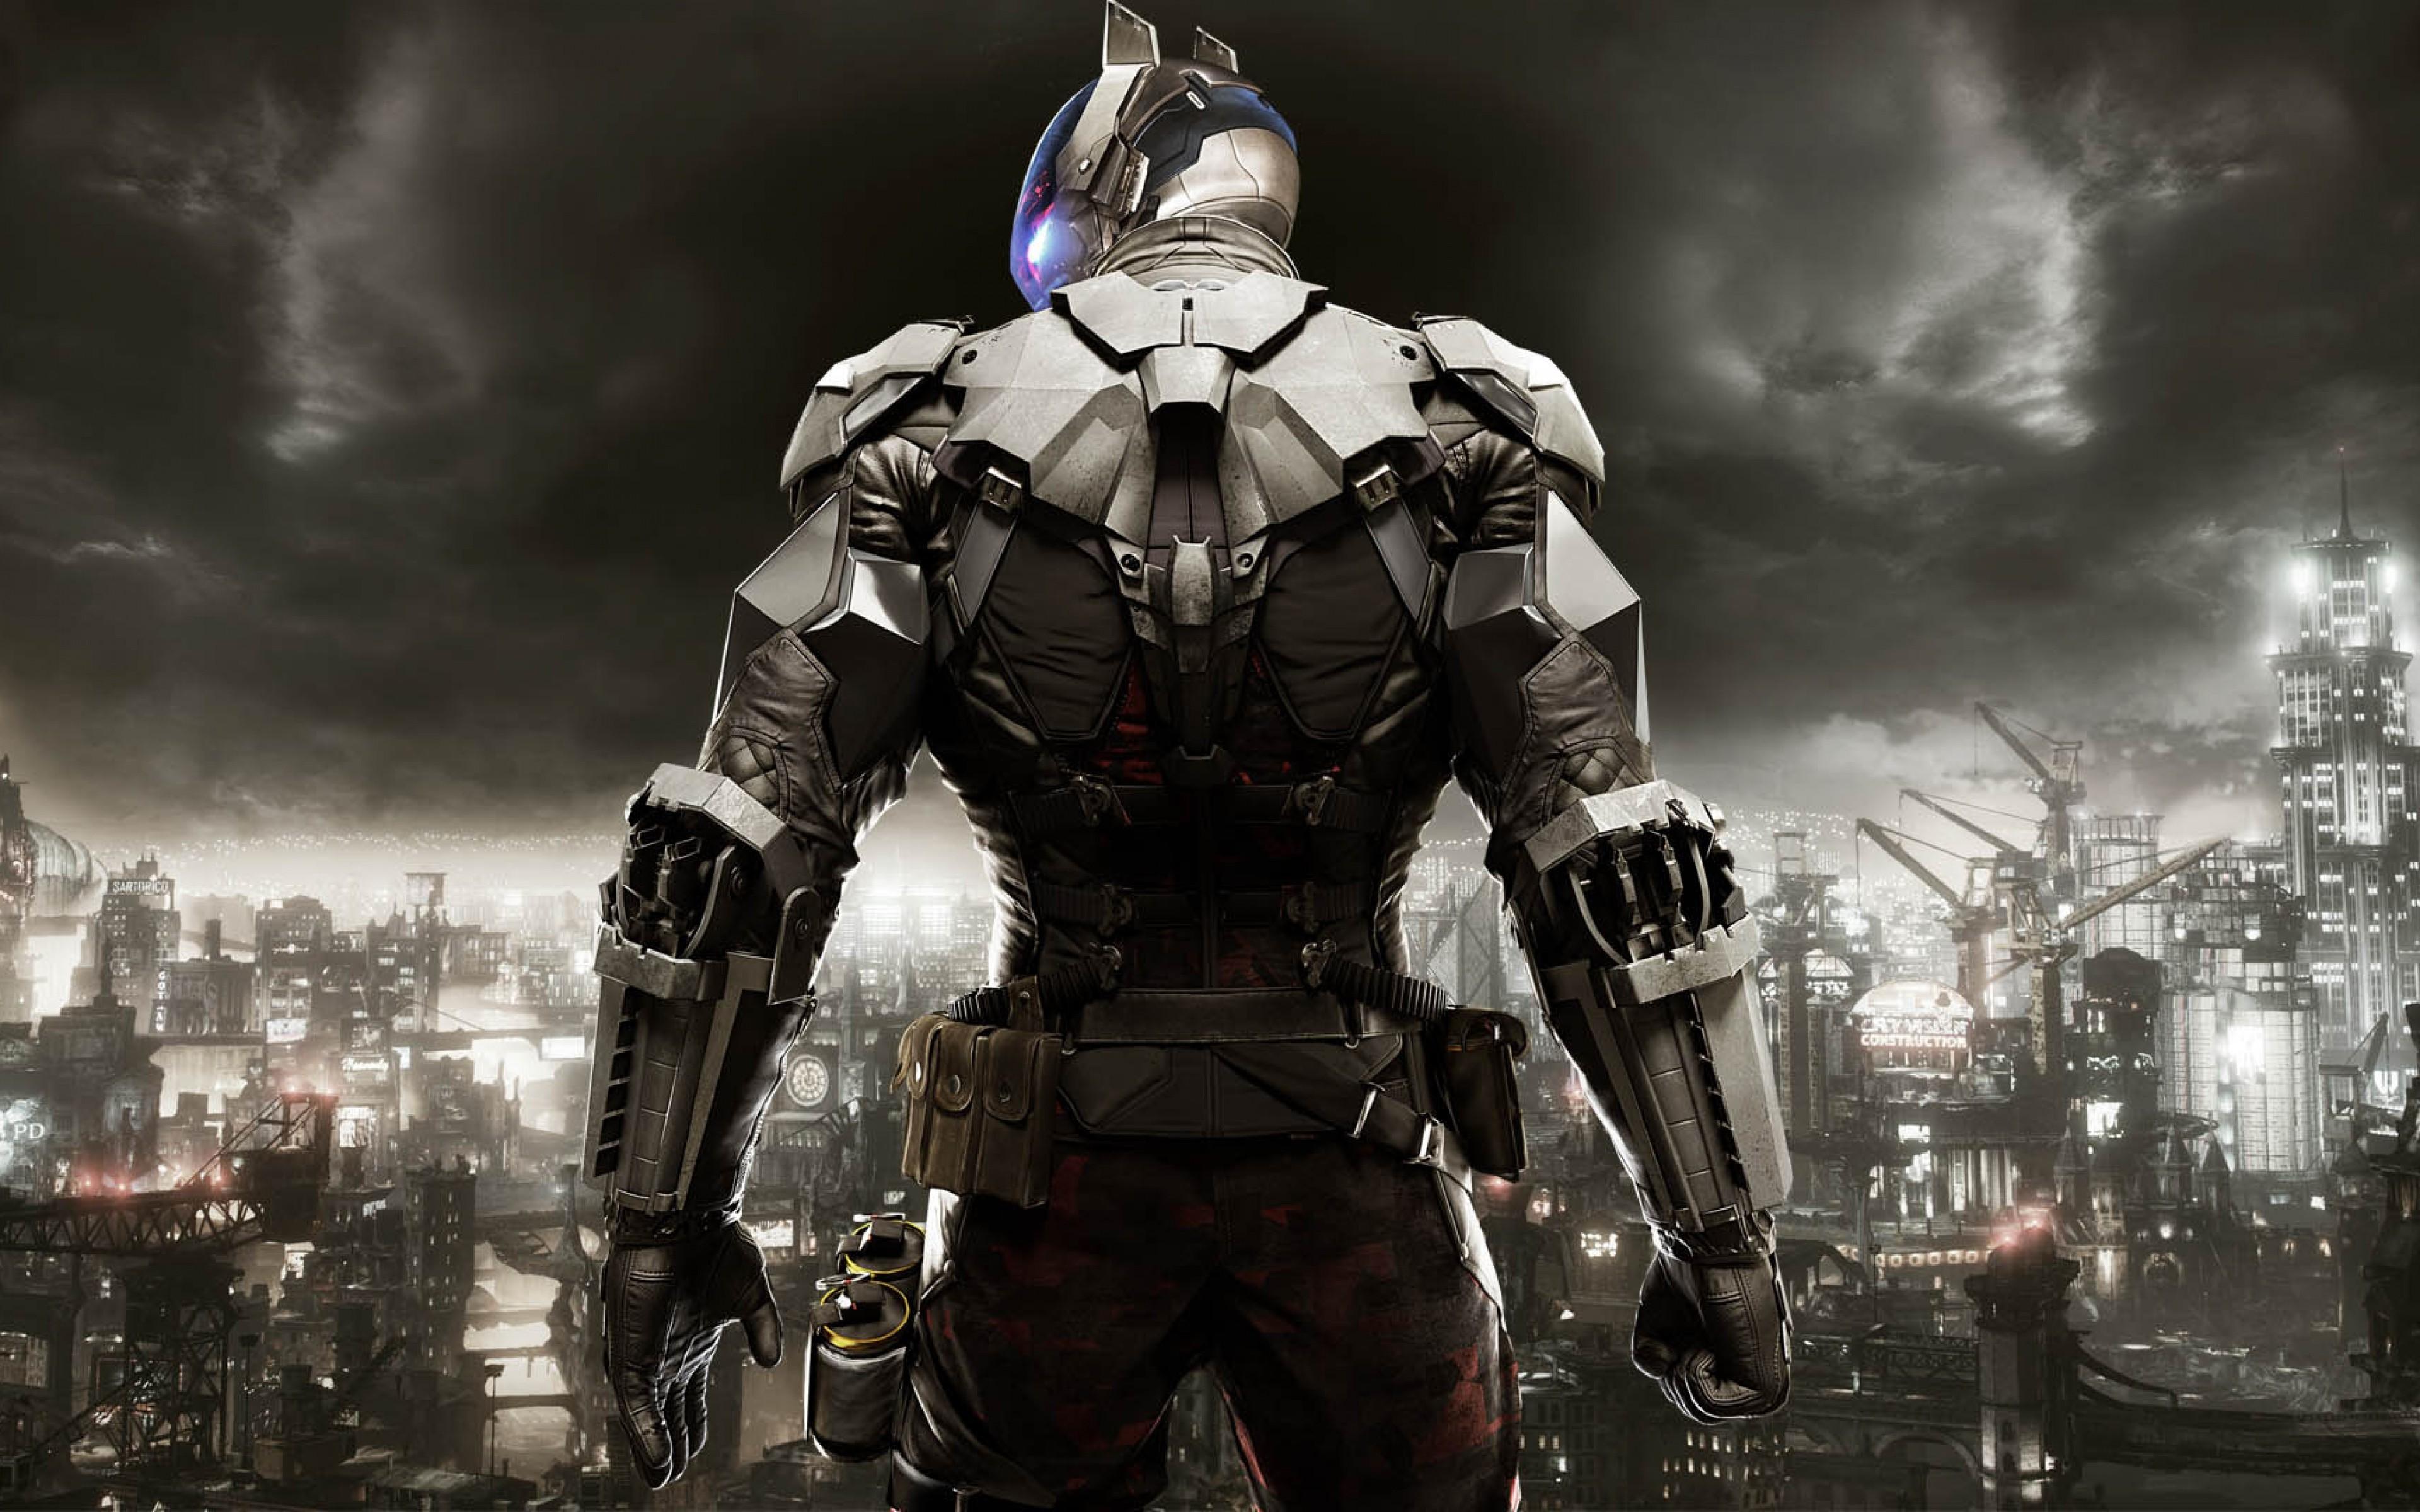 Download Wallpaper High Quality Video Game - video-games-Batman-Arkham-Knight-video-game-characters-darkness-screenshot-computer-wallpaper-pc-game-705554  2018_991665.jpg